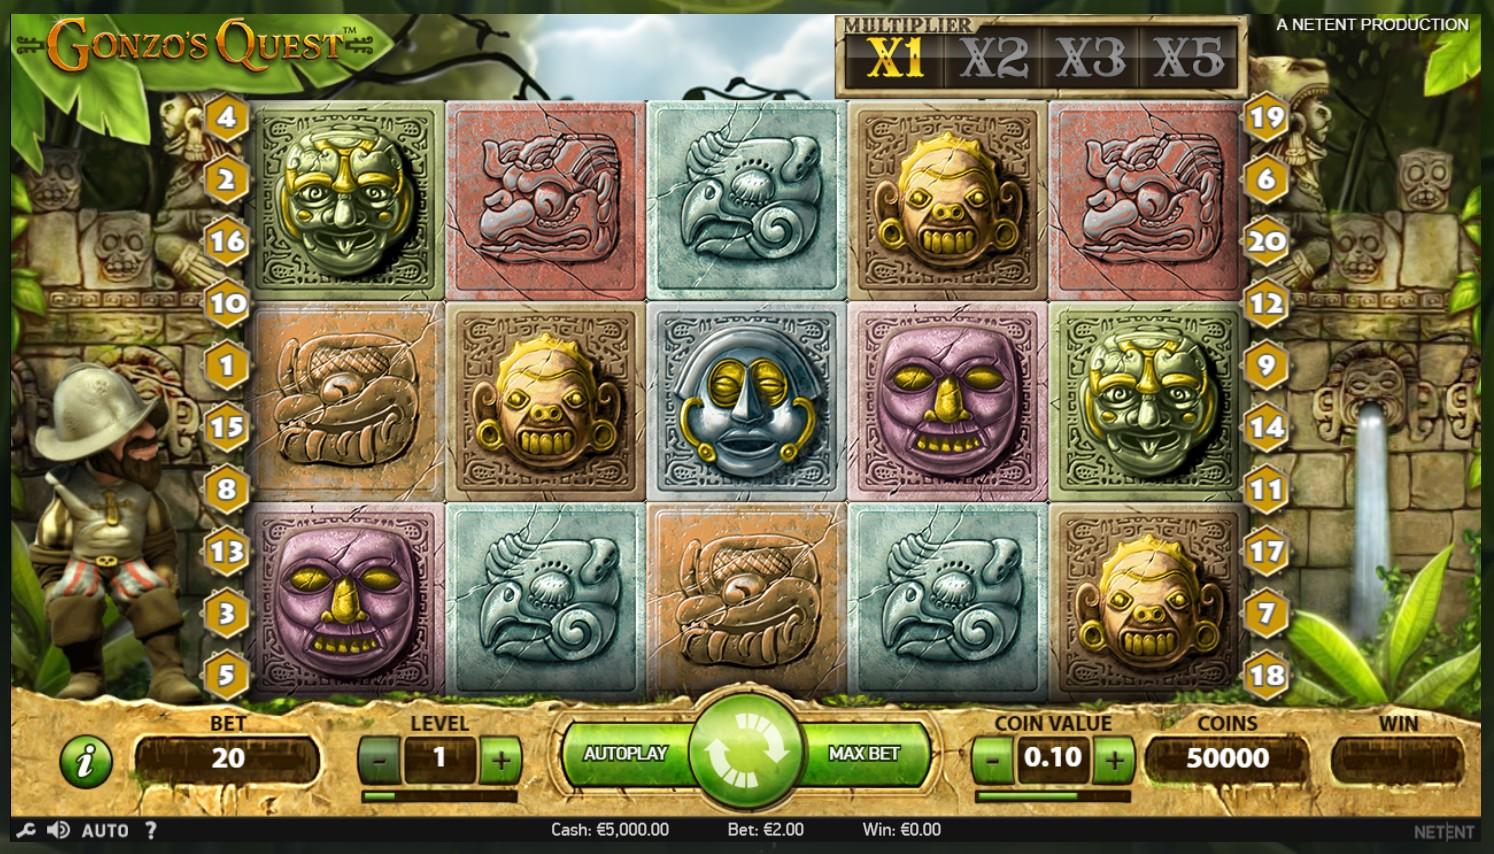 Gonzo Slot - สล็อตออนไลน์ บทความ